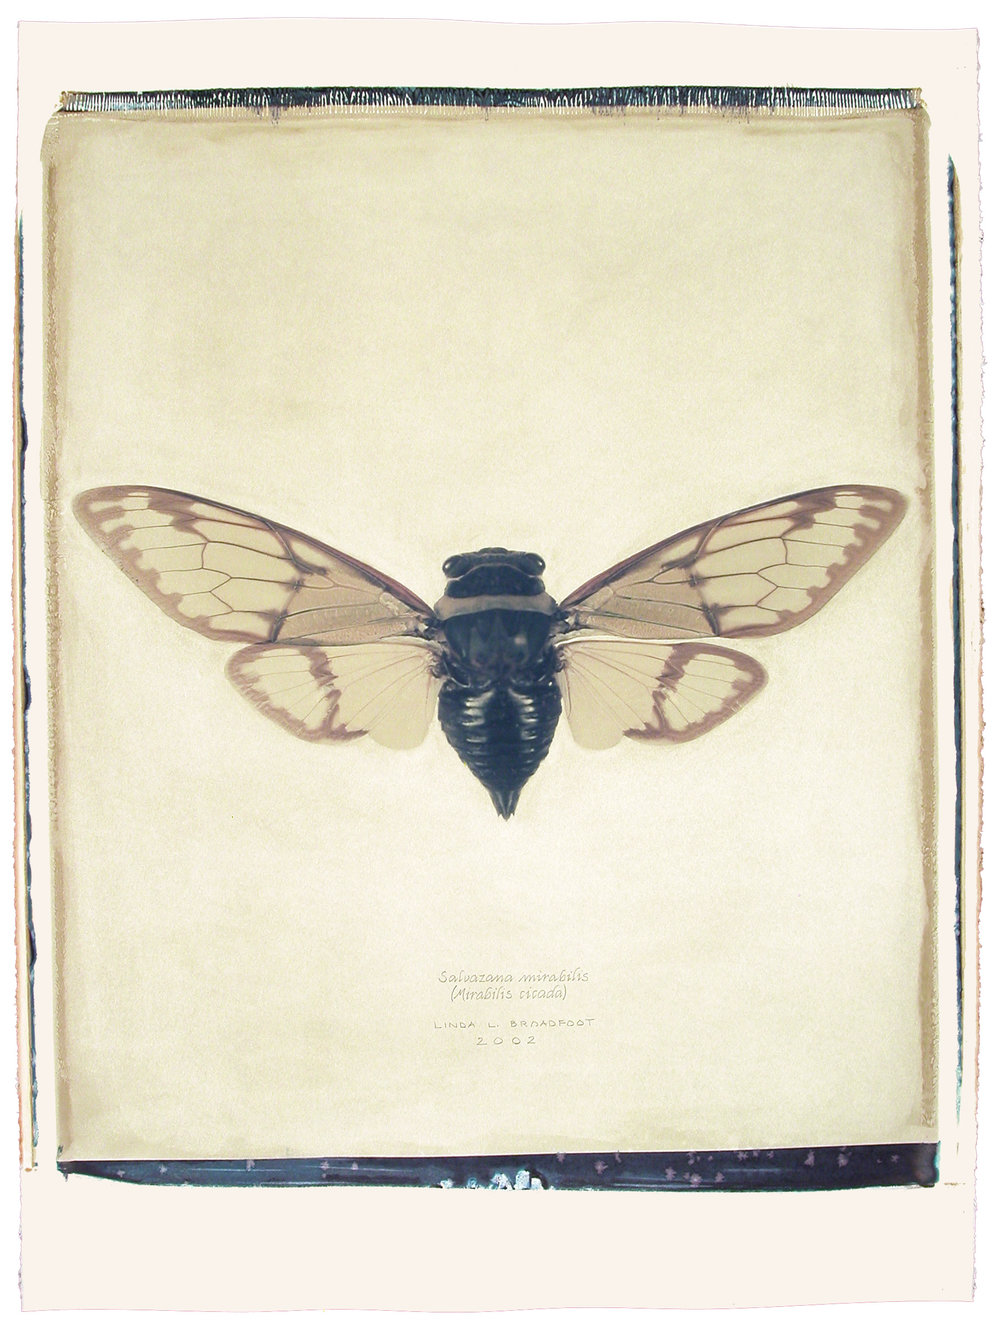 Salvazana mirabilis  (Mirabilis Cicada), 2002